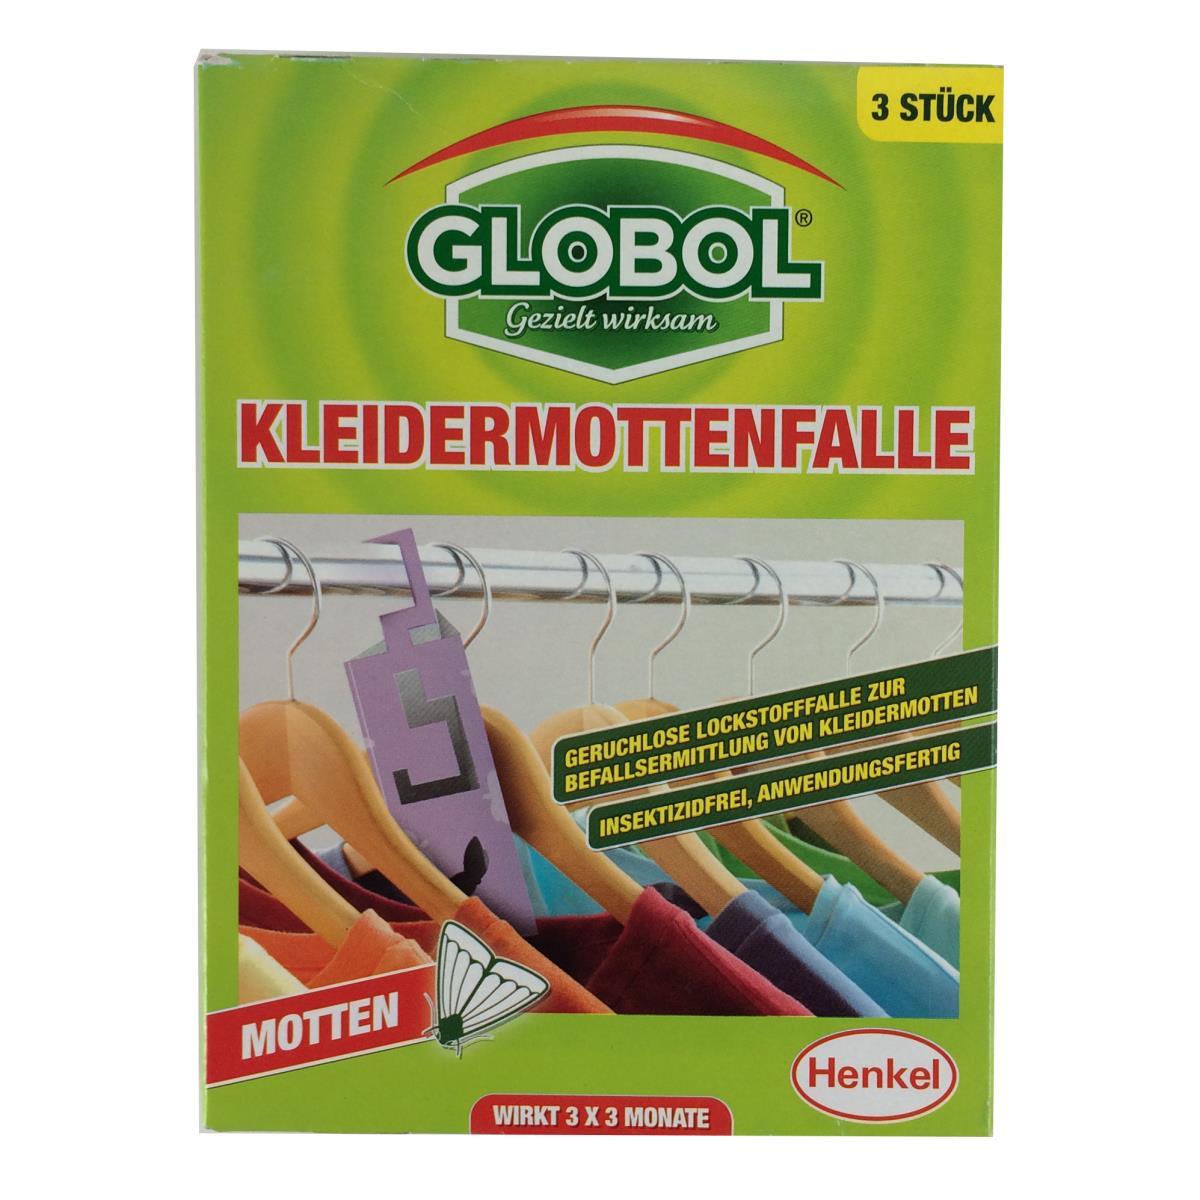 Globol Kleidermottenfalle, Mottenschutz, Mottenfänger, Klebefalle, 3 St.,Globol,5099831644427, 5099831644427